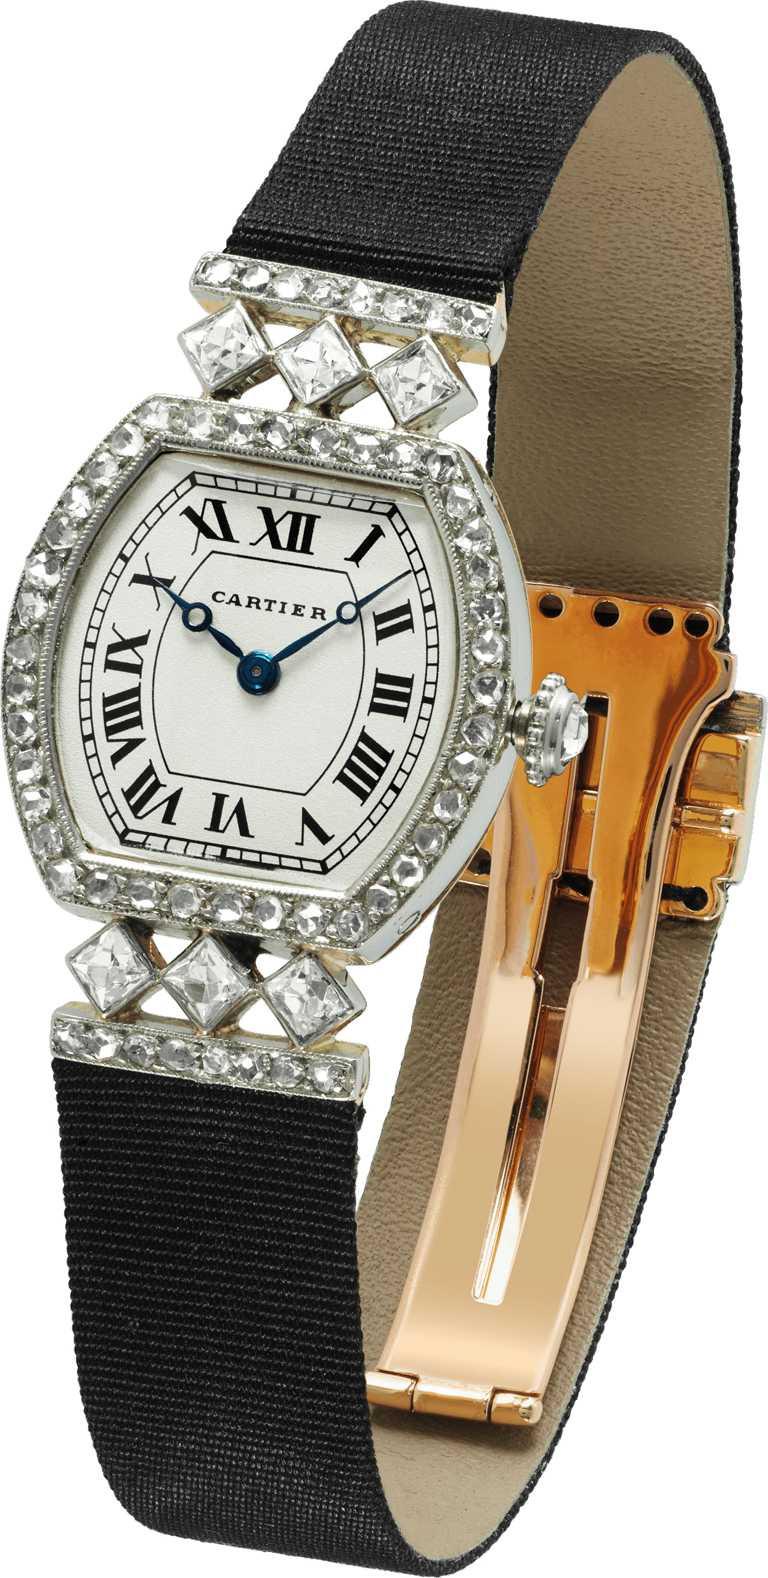 Cartier「Cartier Tradition古董珍藏系列」TORTUE腕錶╱卡地亞倫敦,1919年;白金、黃金與玫瑰金、鑽石╱3,390,000元。(圖╱Cartier提供)